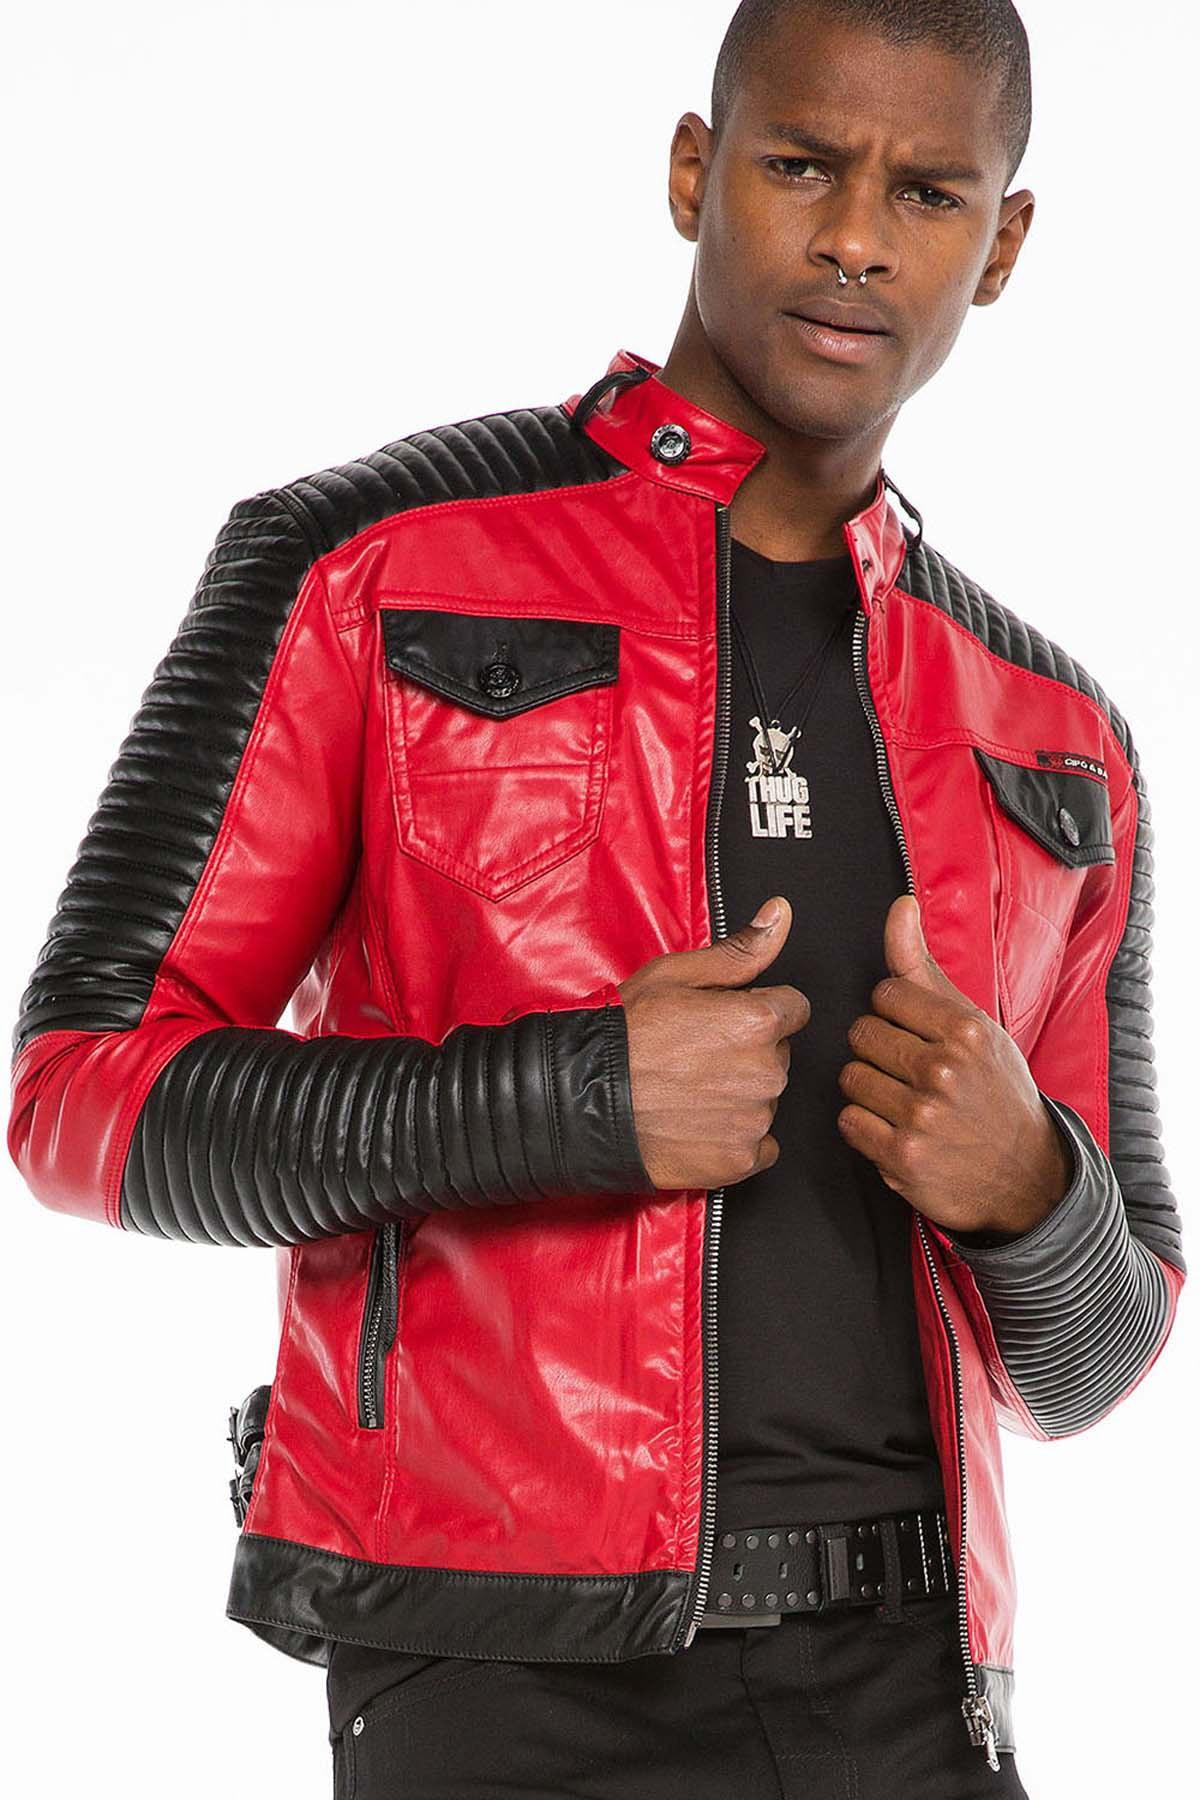 فروش پستی ژاکت چرم مردانه ترک برند Cipo&Baxx رنگ قرمز ty32525036